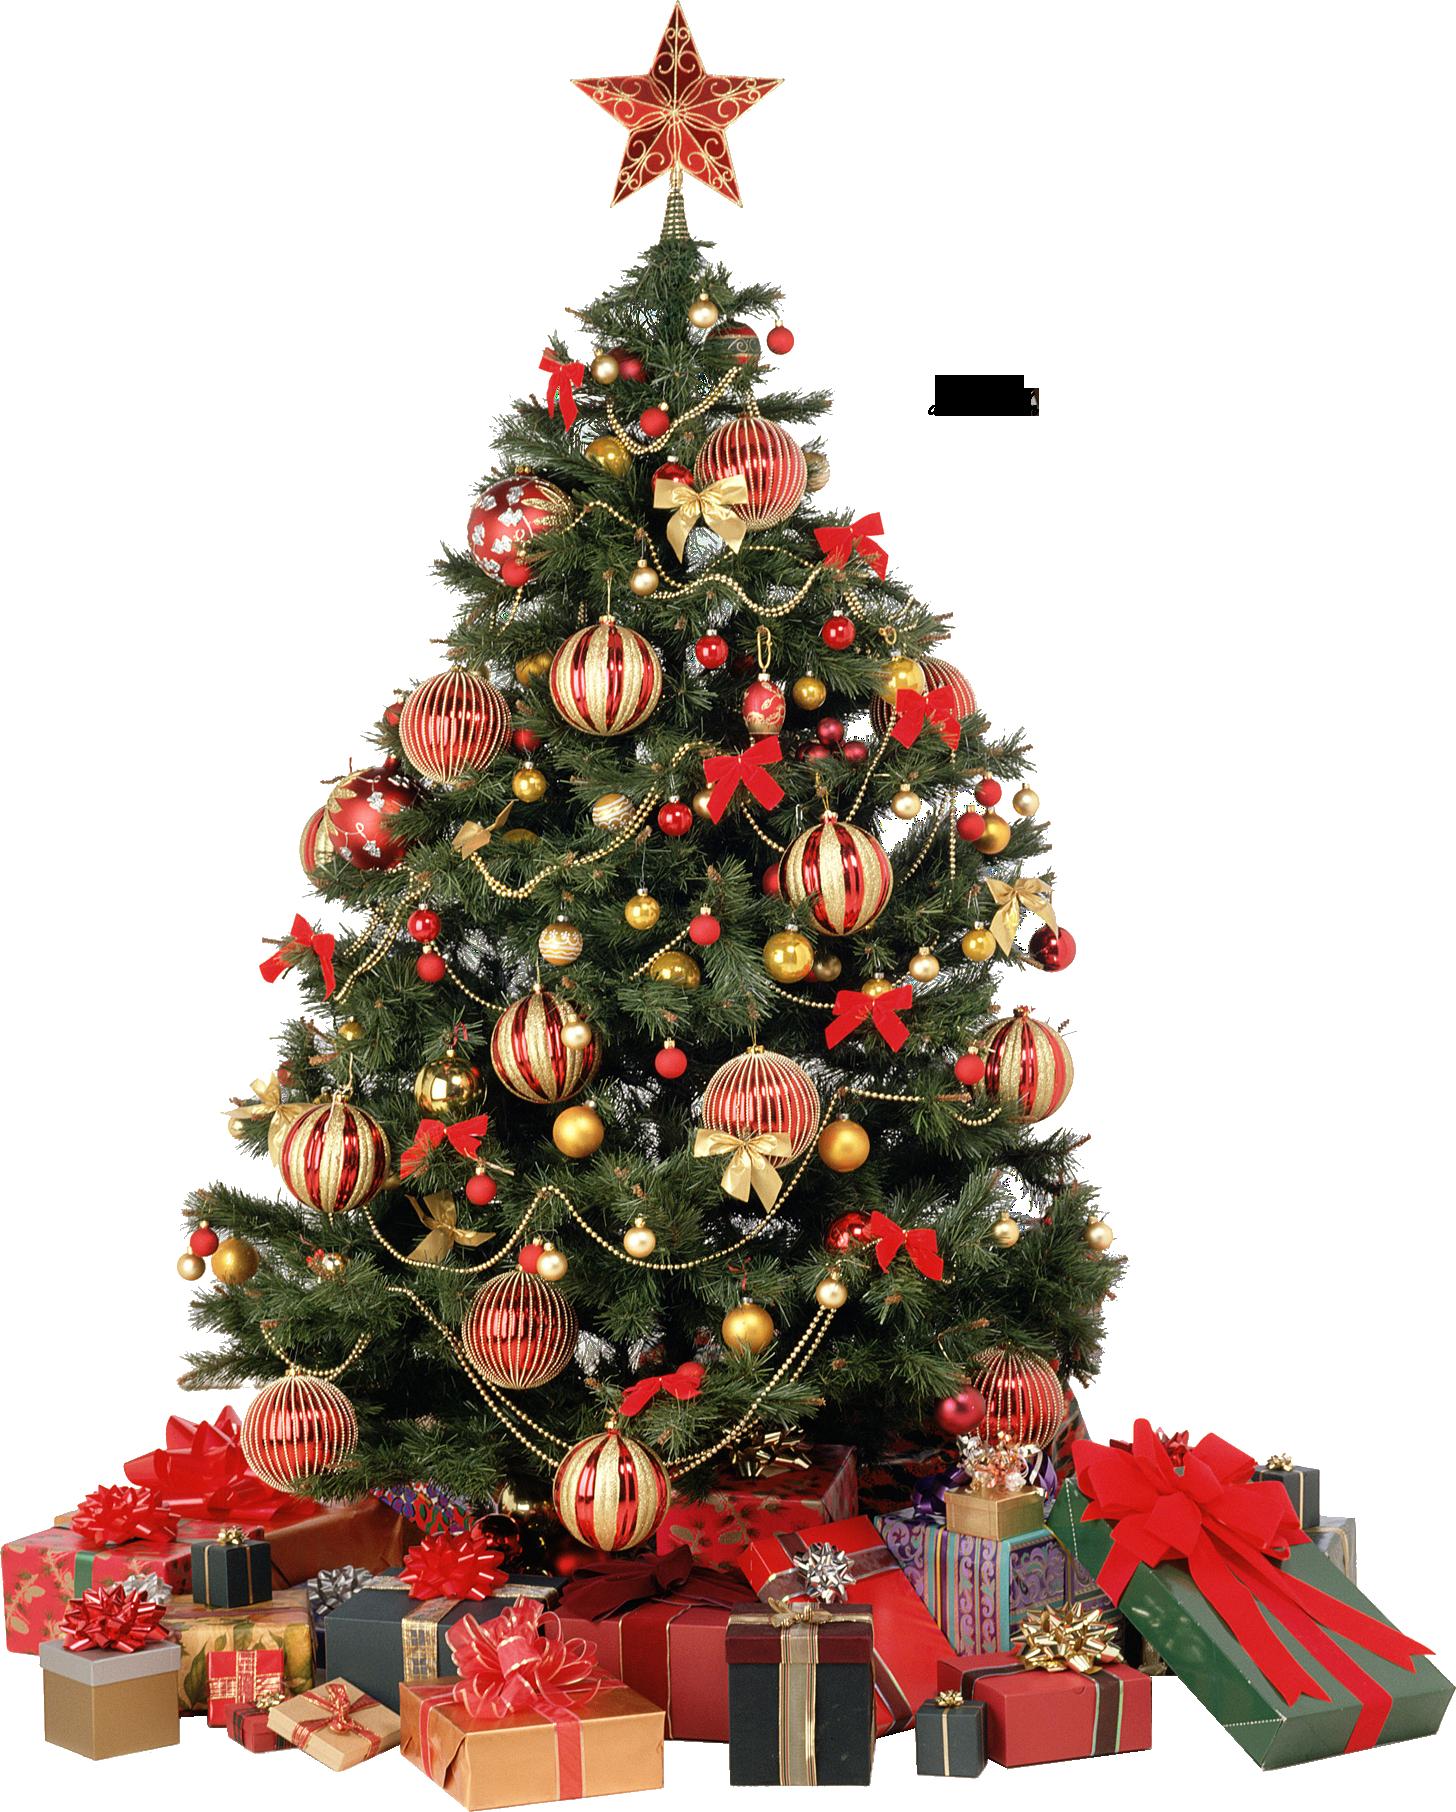 X Mas Tree PNG - 46374